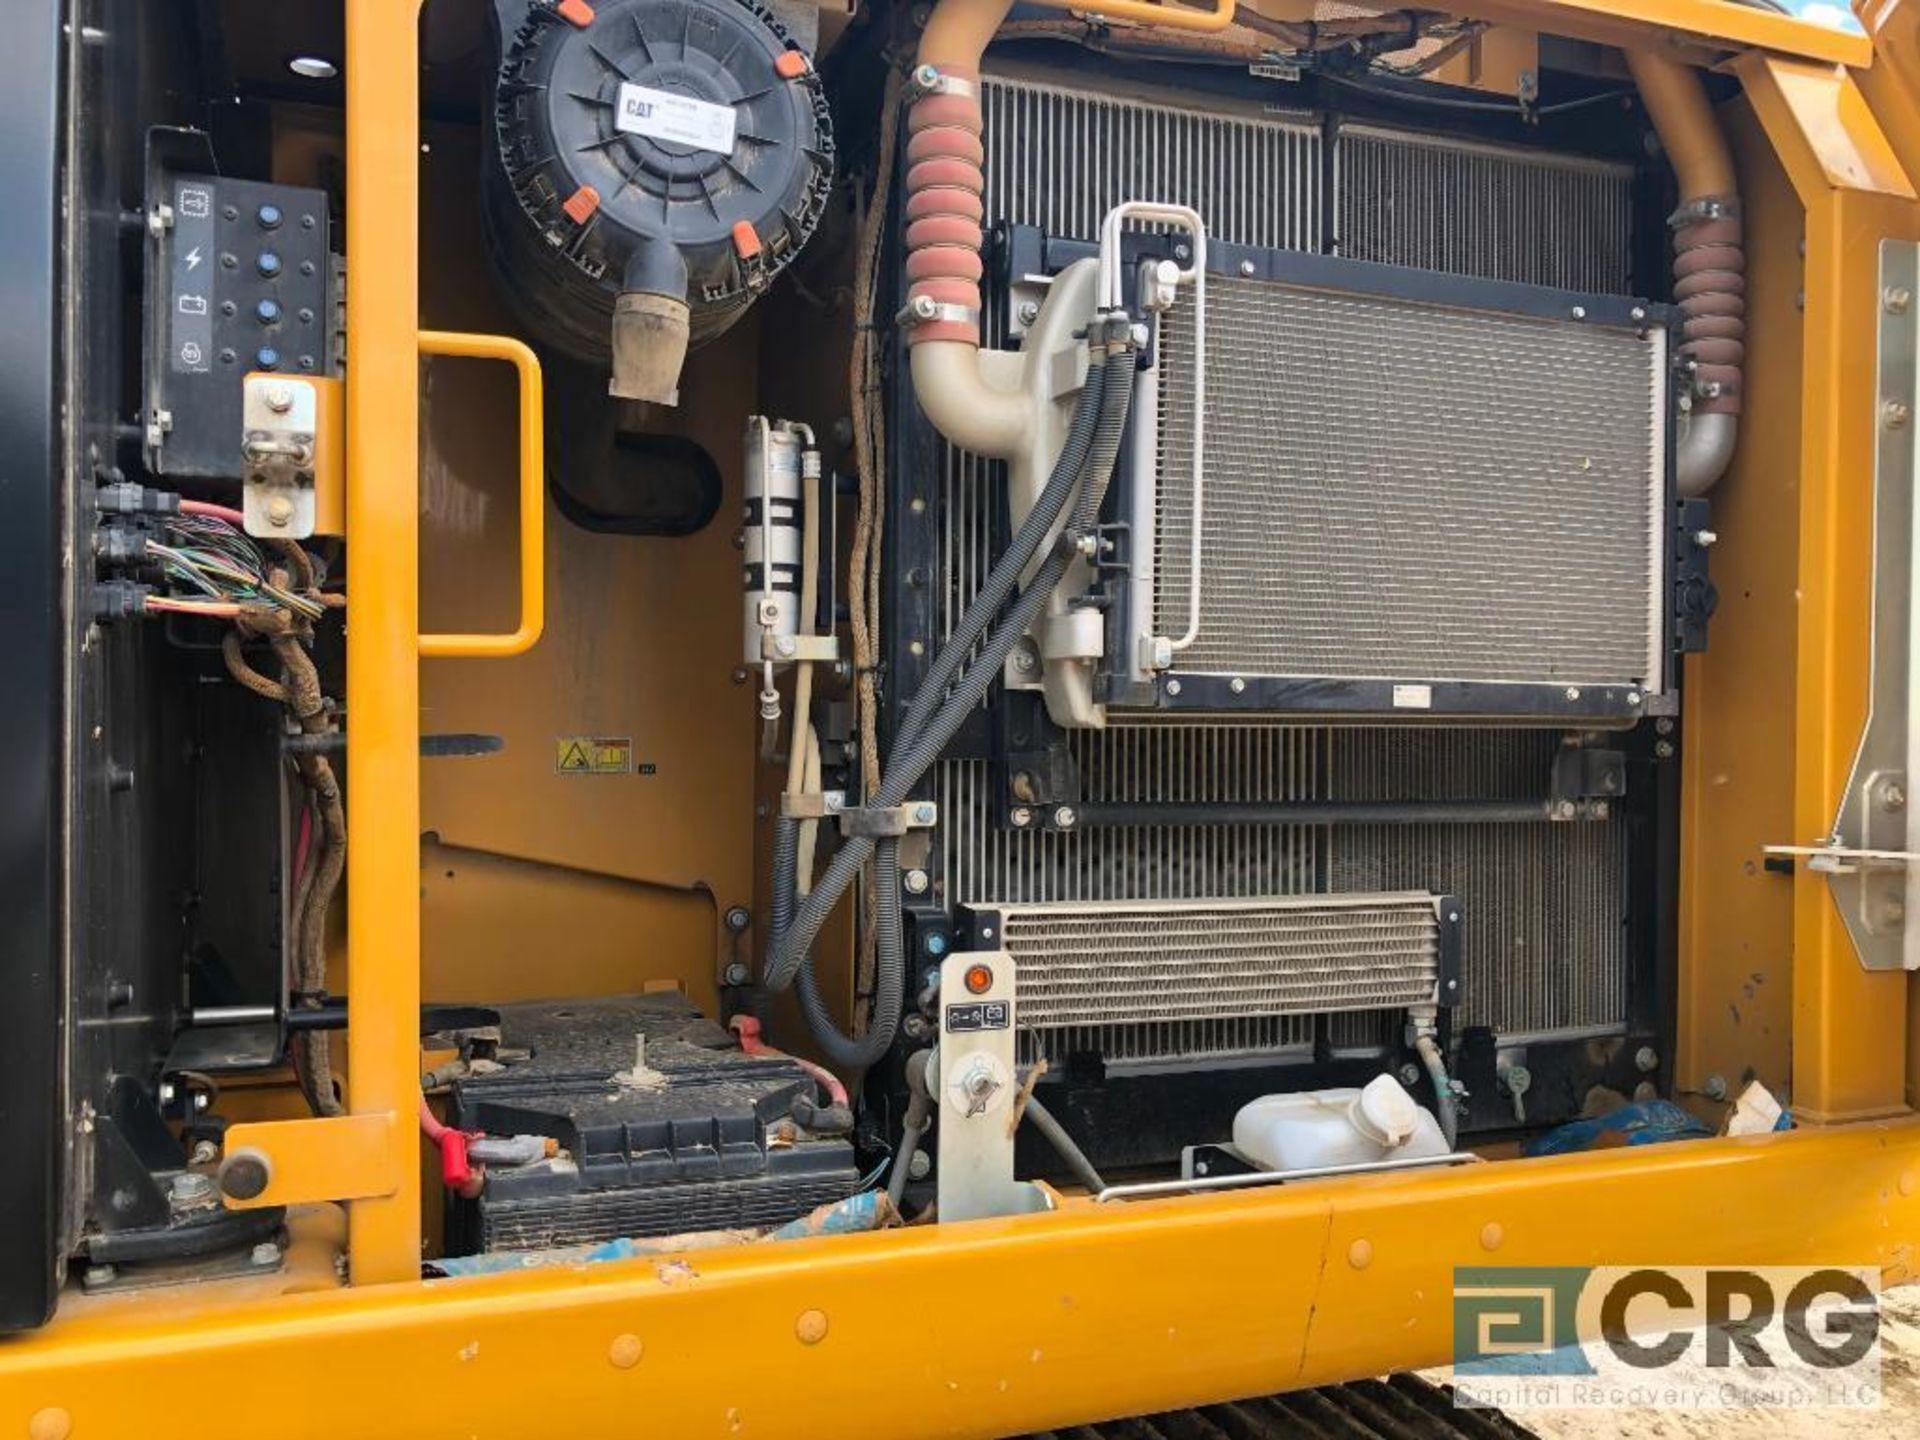 Lot 307 - 2016 CAT 323FL TC Excavator CAT Grade Control - Depth and Slope, 18 ft. 8 in. Heavy Duty Boom, 9